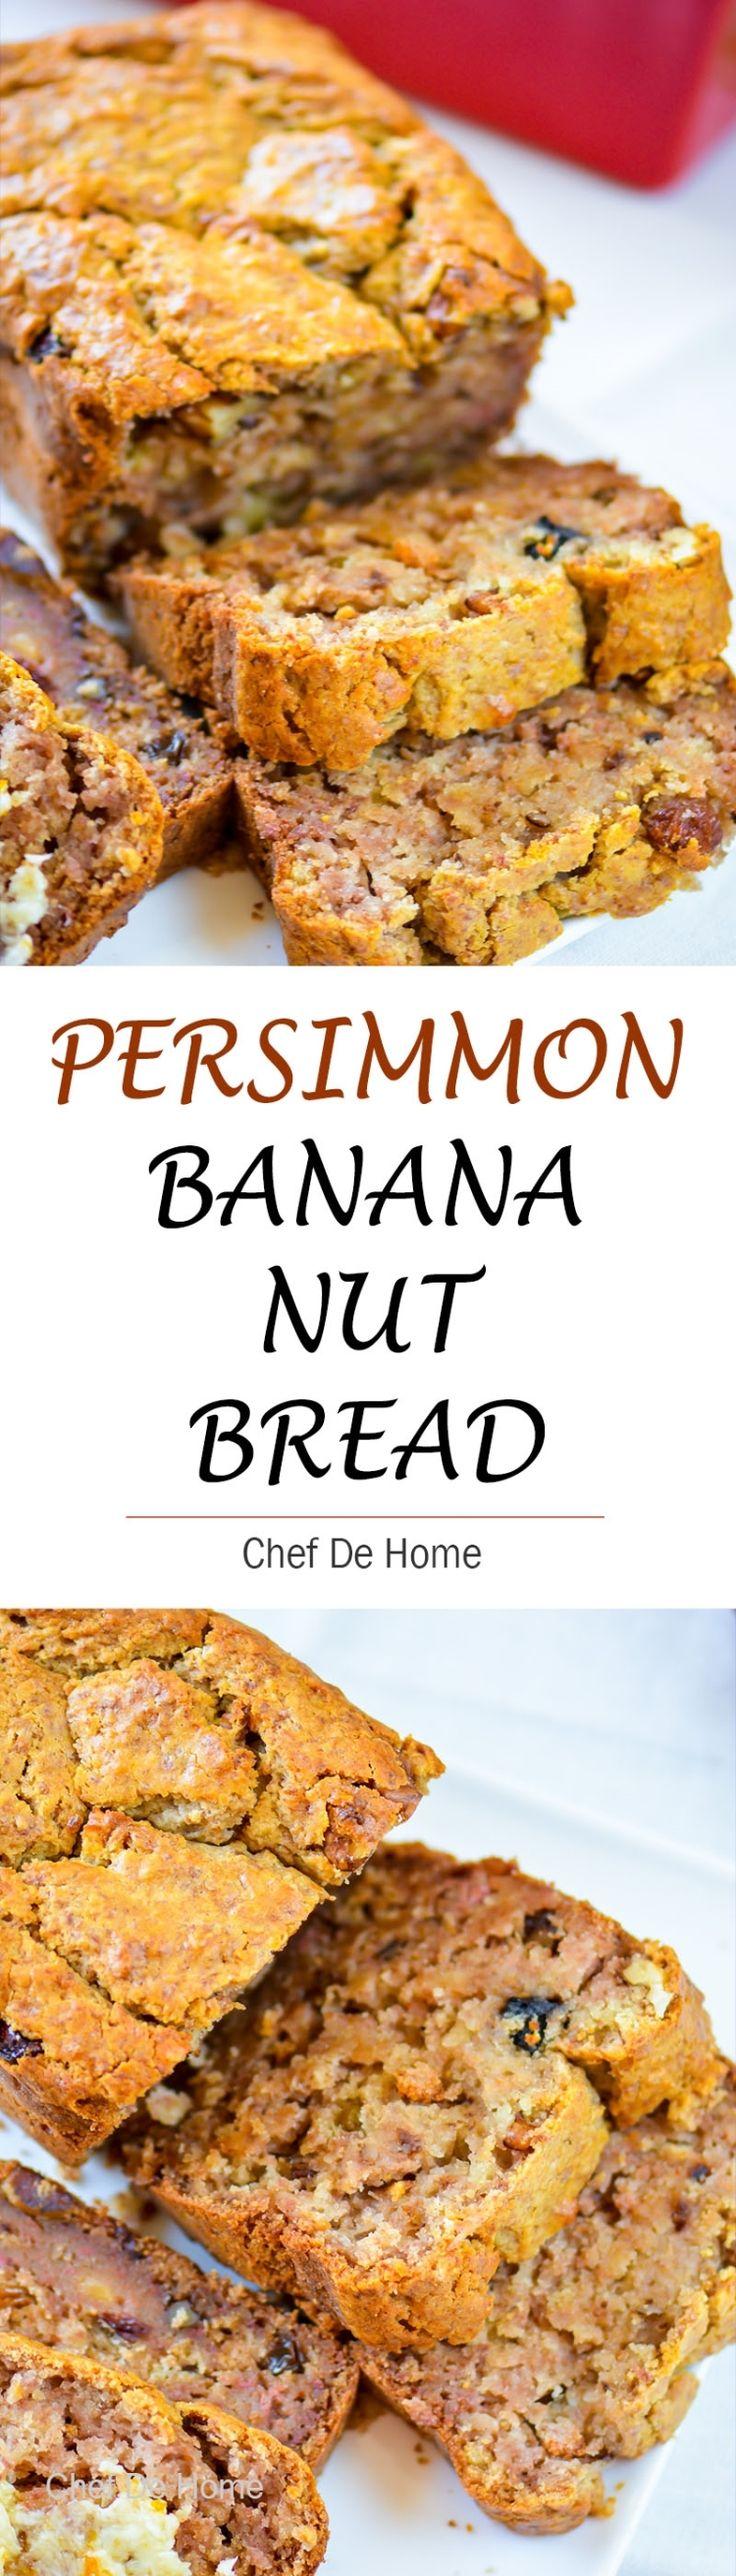 Persimmon Banana Nut Bread : Moist Banana bread with fresh persimmon fruit puree, walnuts and raisins for winter breakfast.